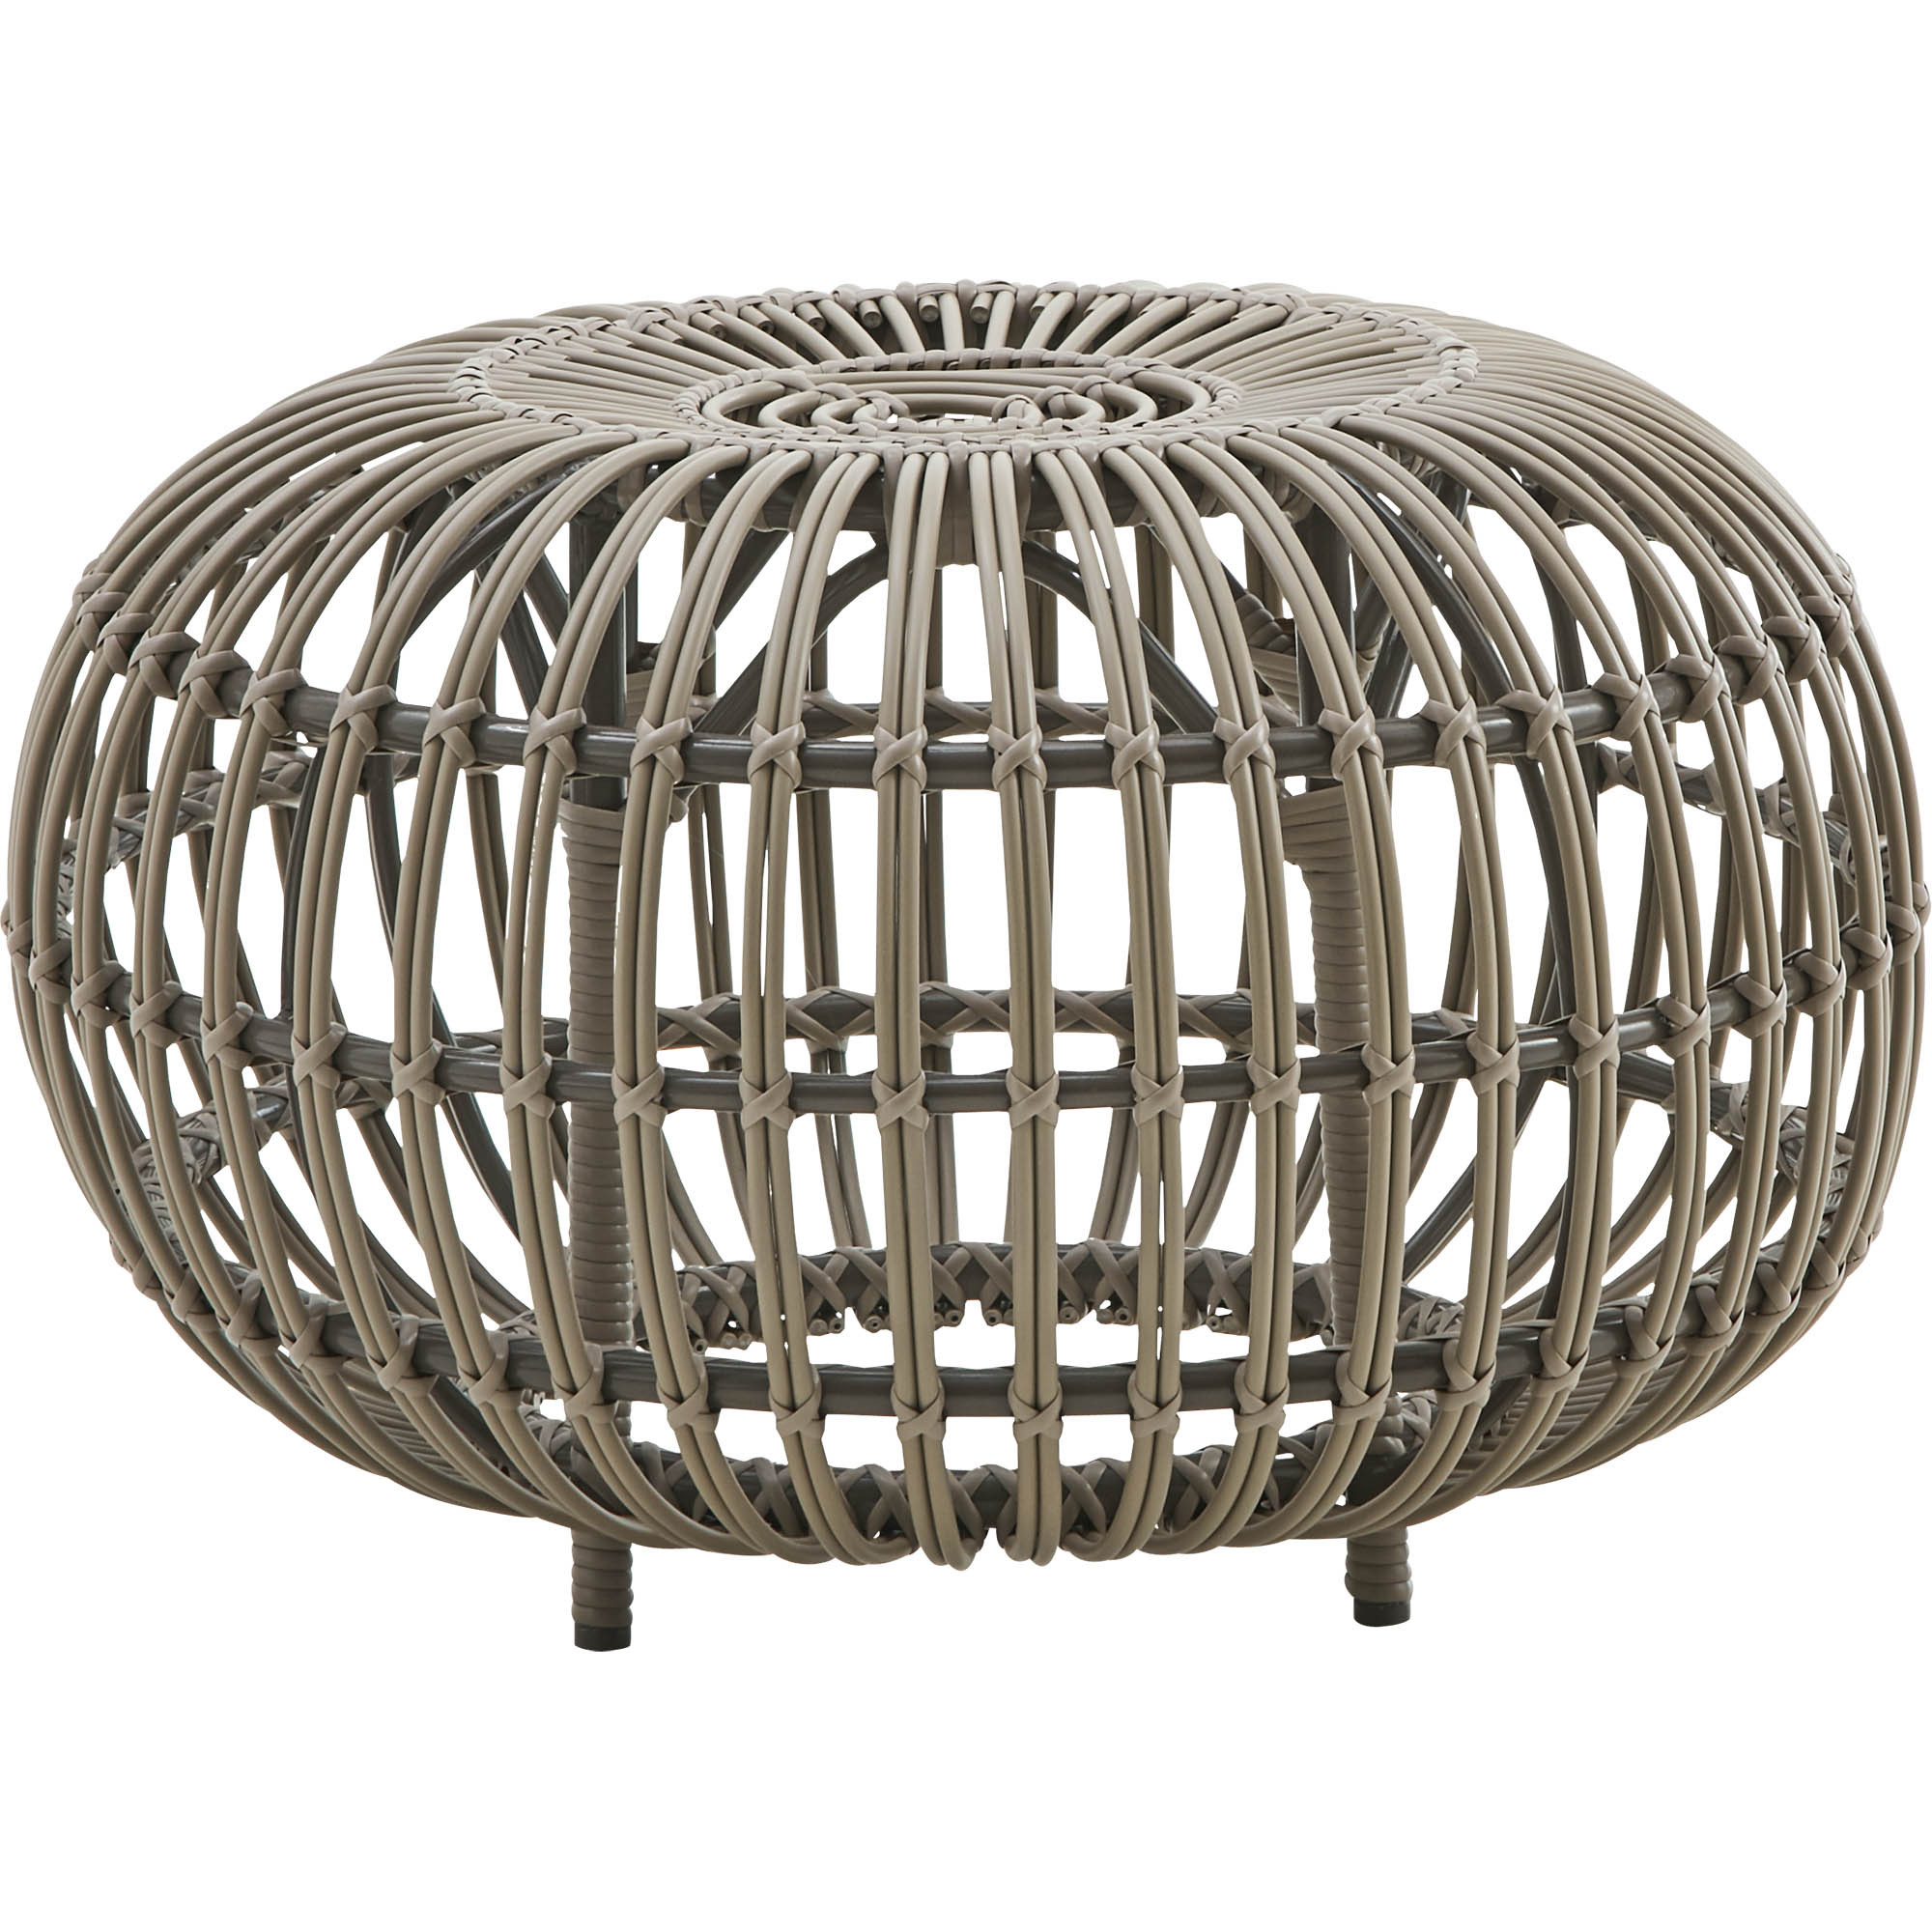 Moccachino ottoman från Sika-Design.